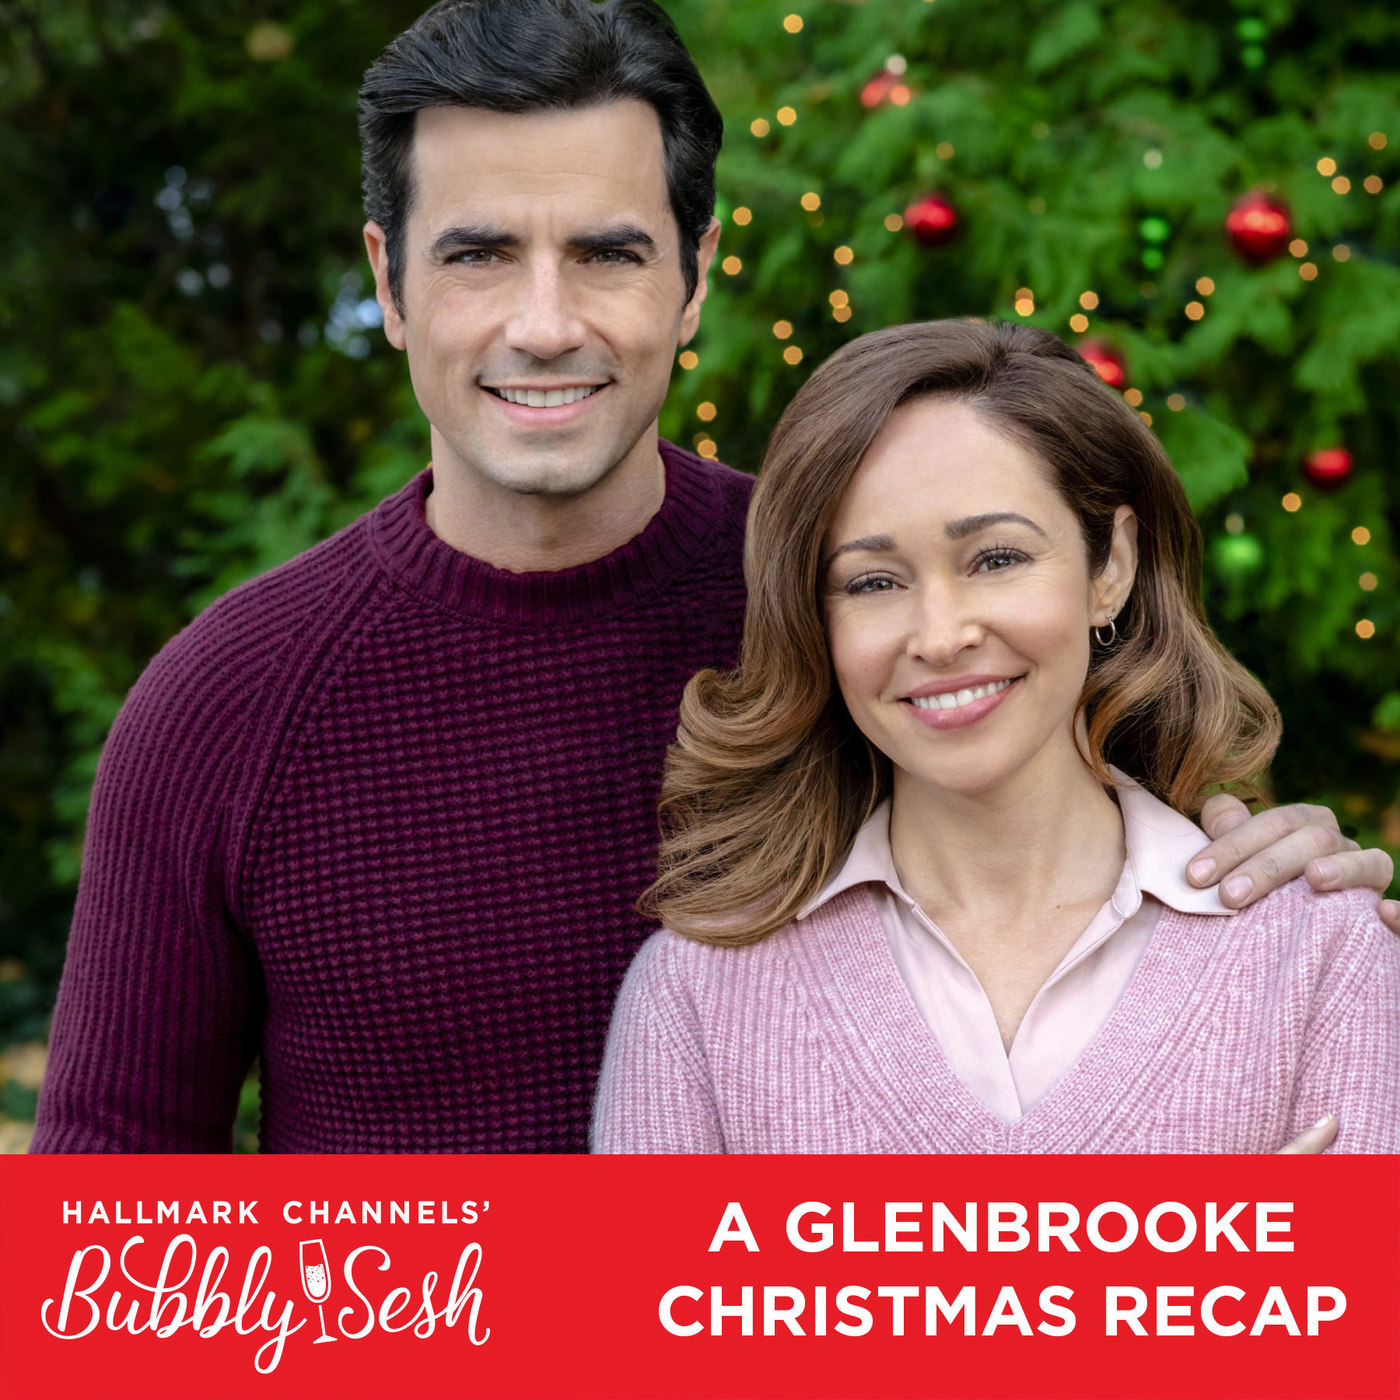 A Glenbrooke Christmas Recap with Guest Autumn Reeser